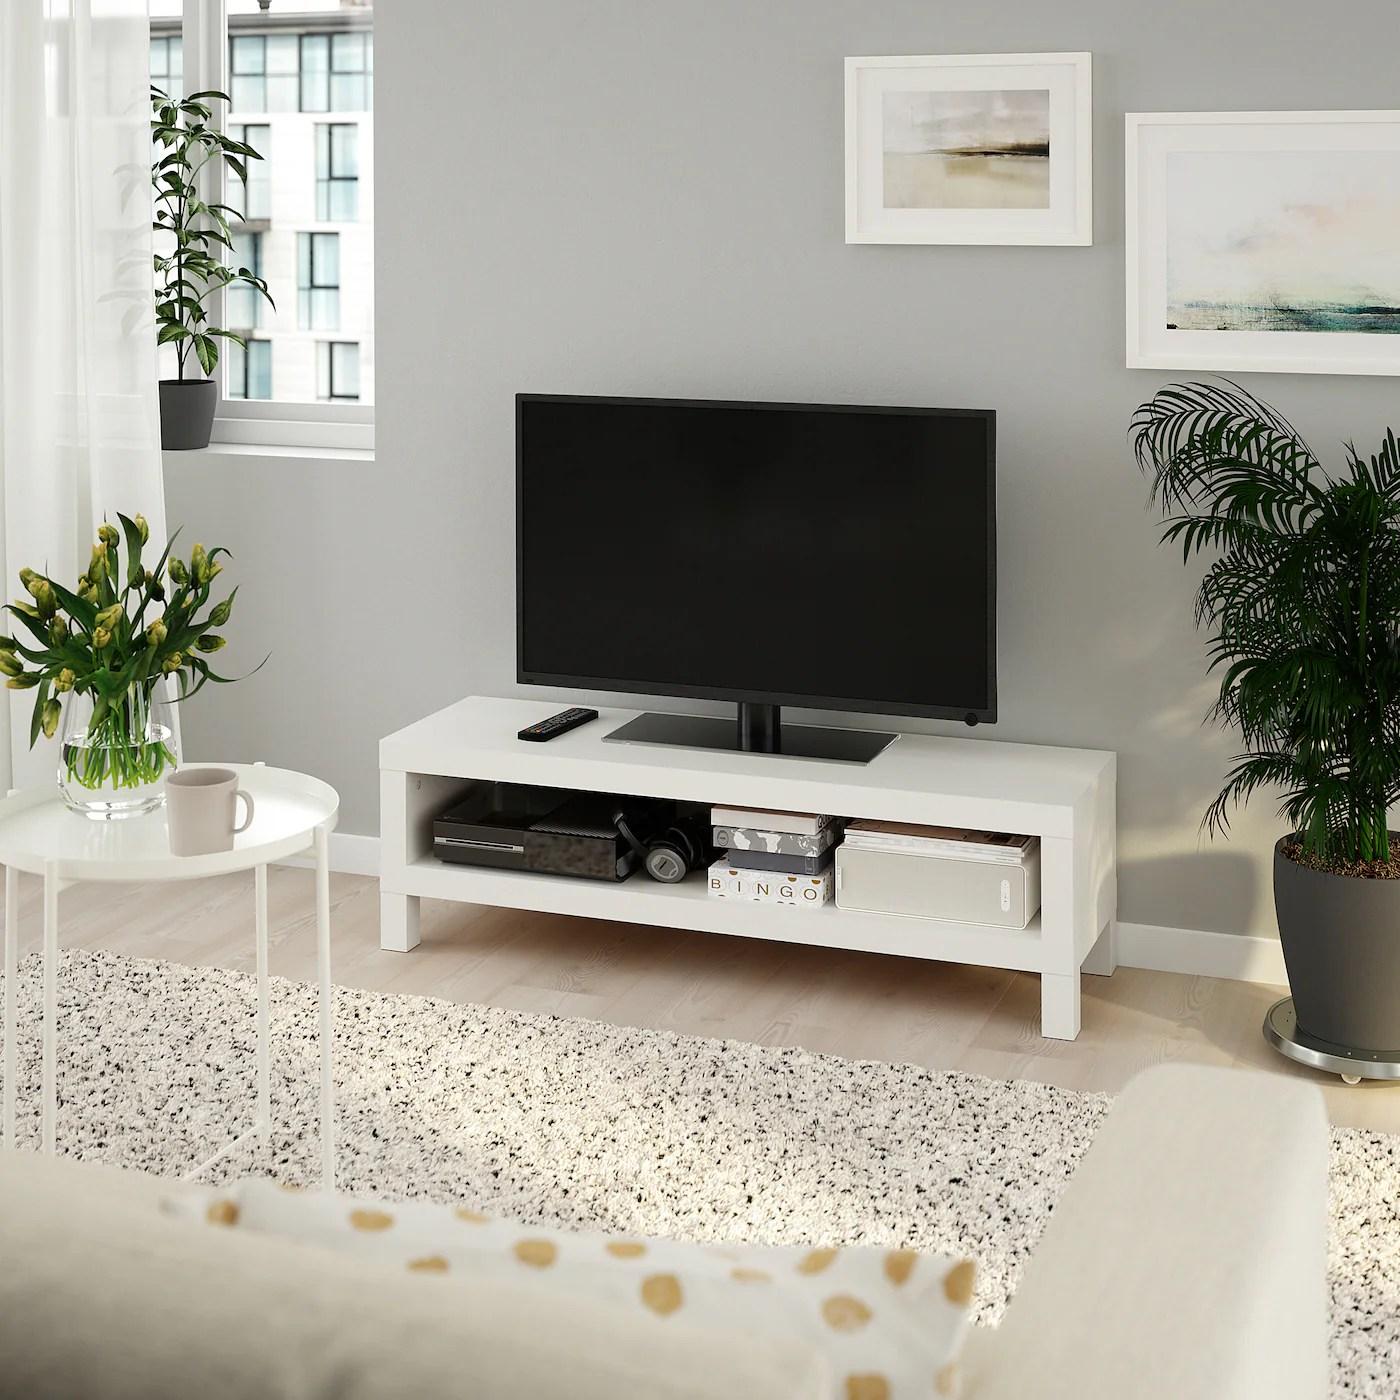 Lack Banc Tv Blanc 120x35x36 Cm Ikea